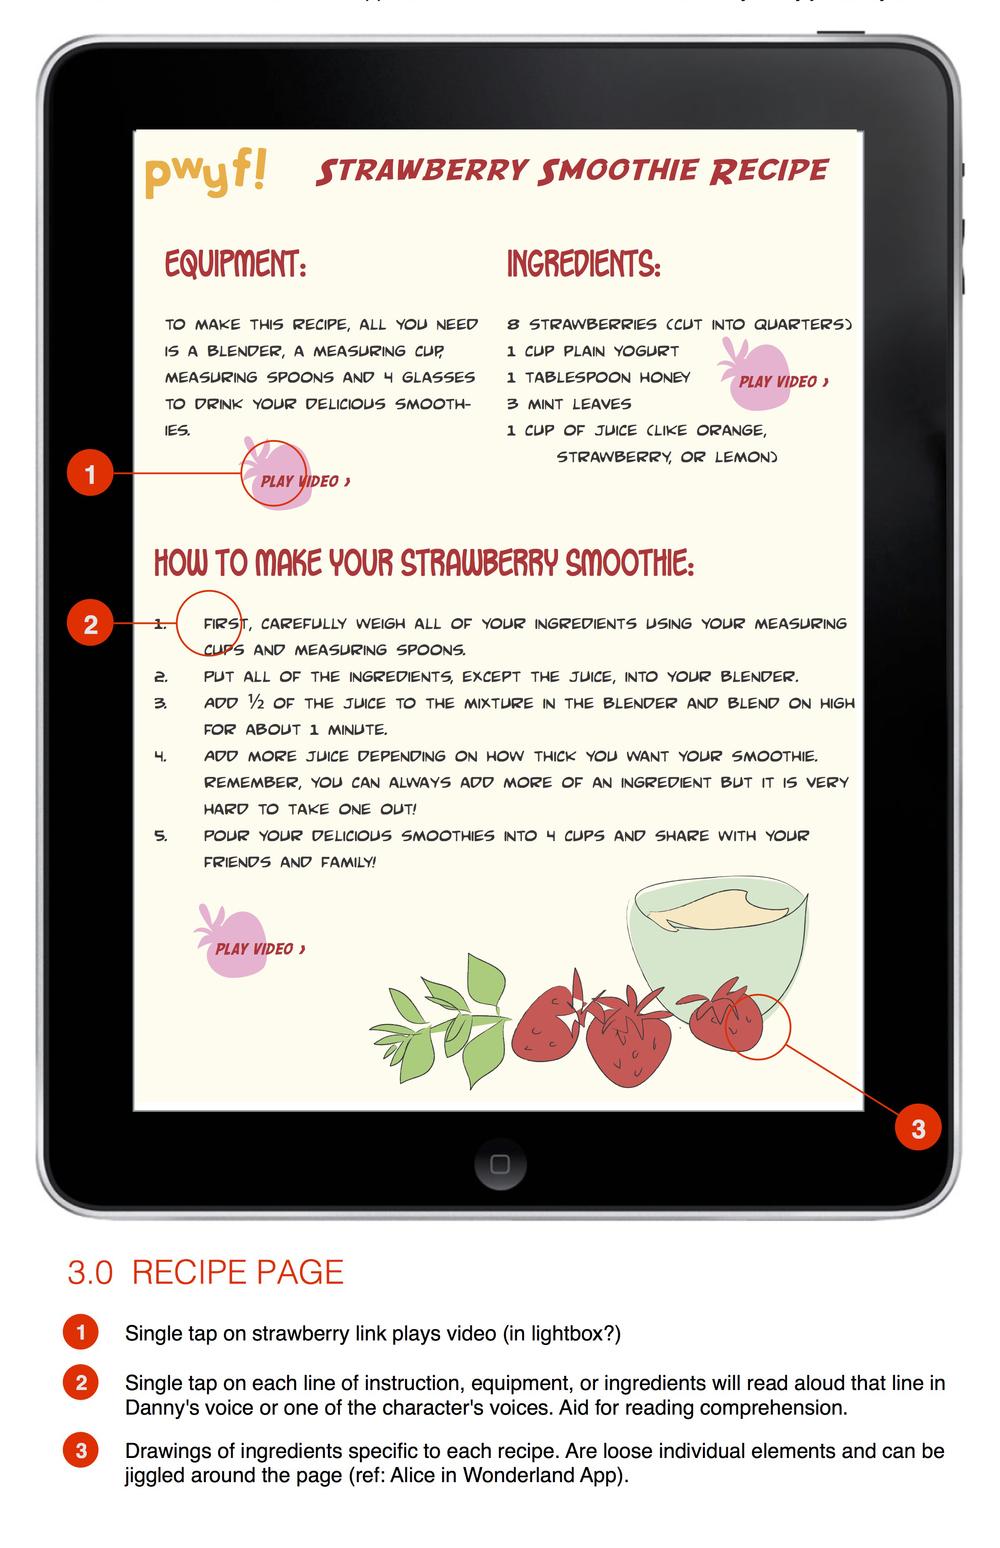 PWYF!_iPadApp_wireframes_large.7.jpg